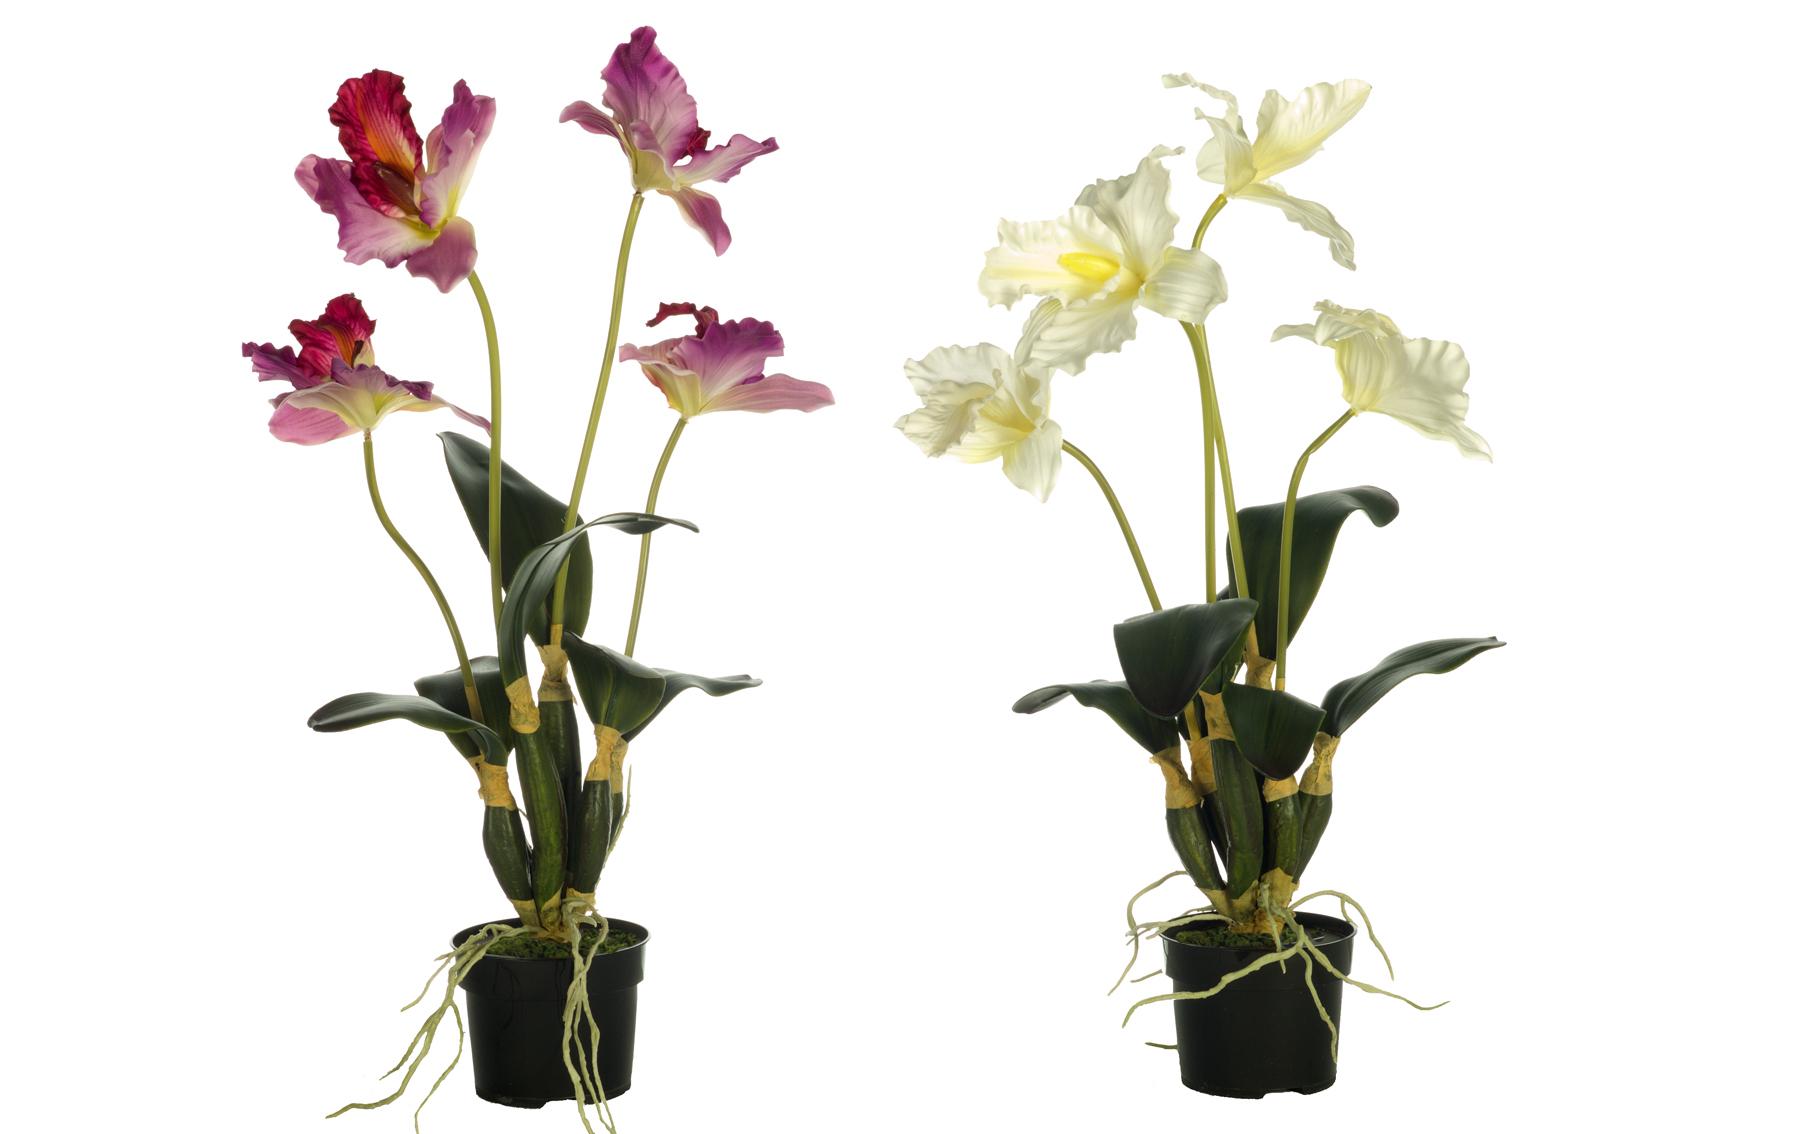 hibiscus www.floresymuchomas.com